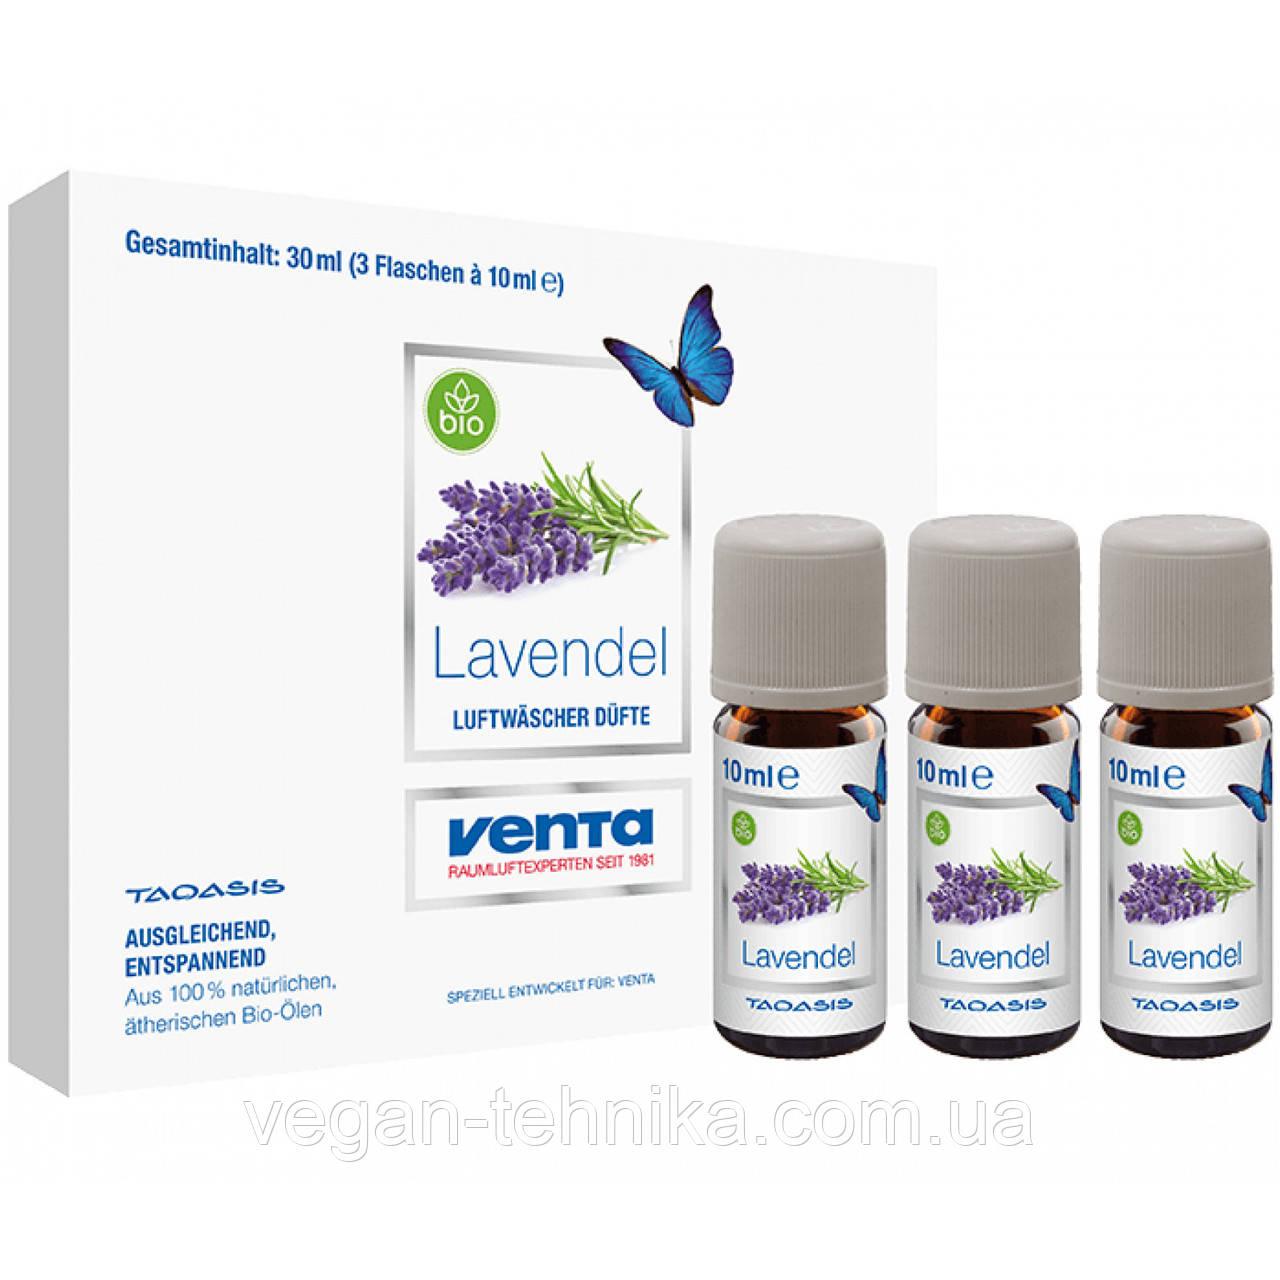 Набор аромата лаванды Venta